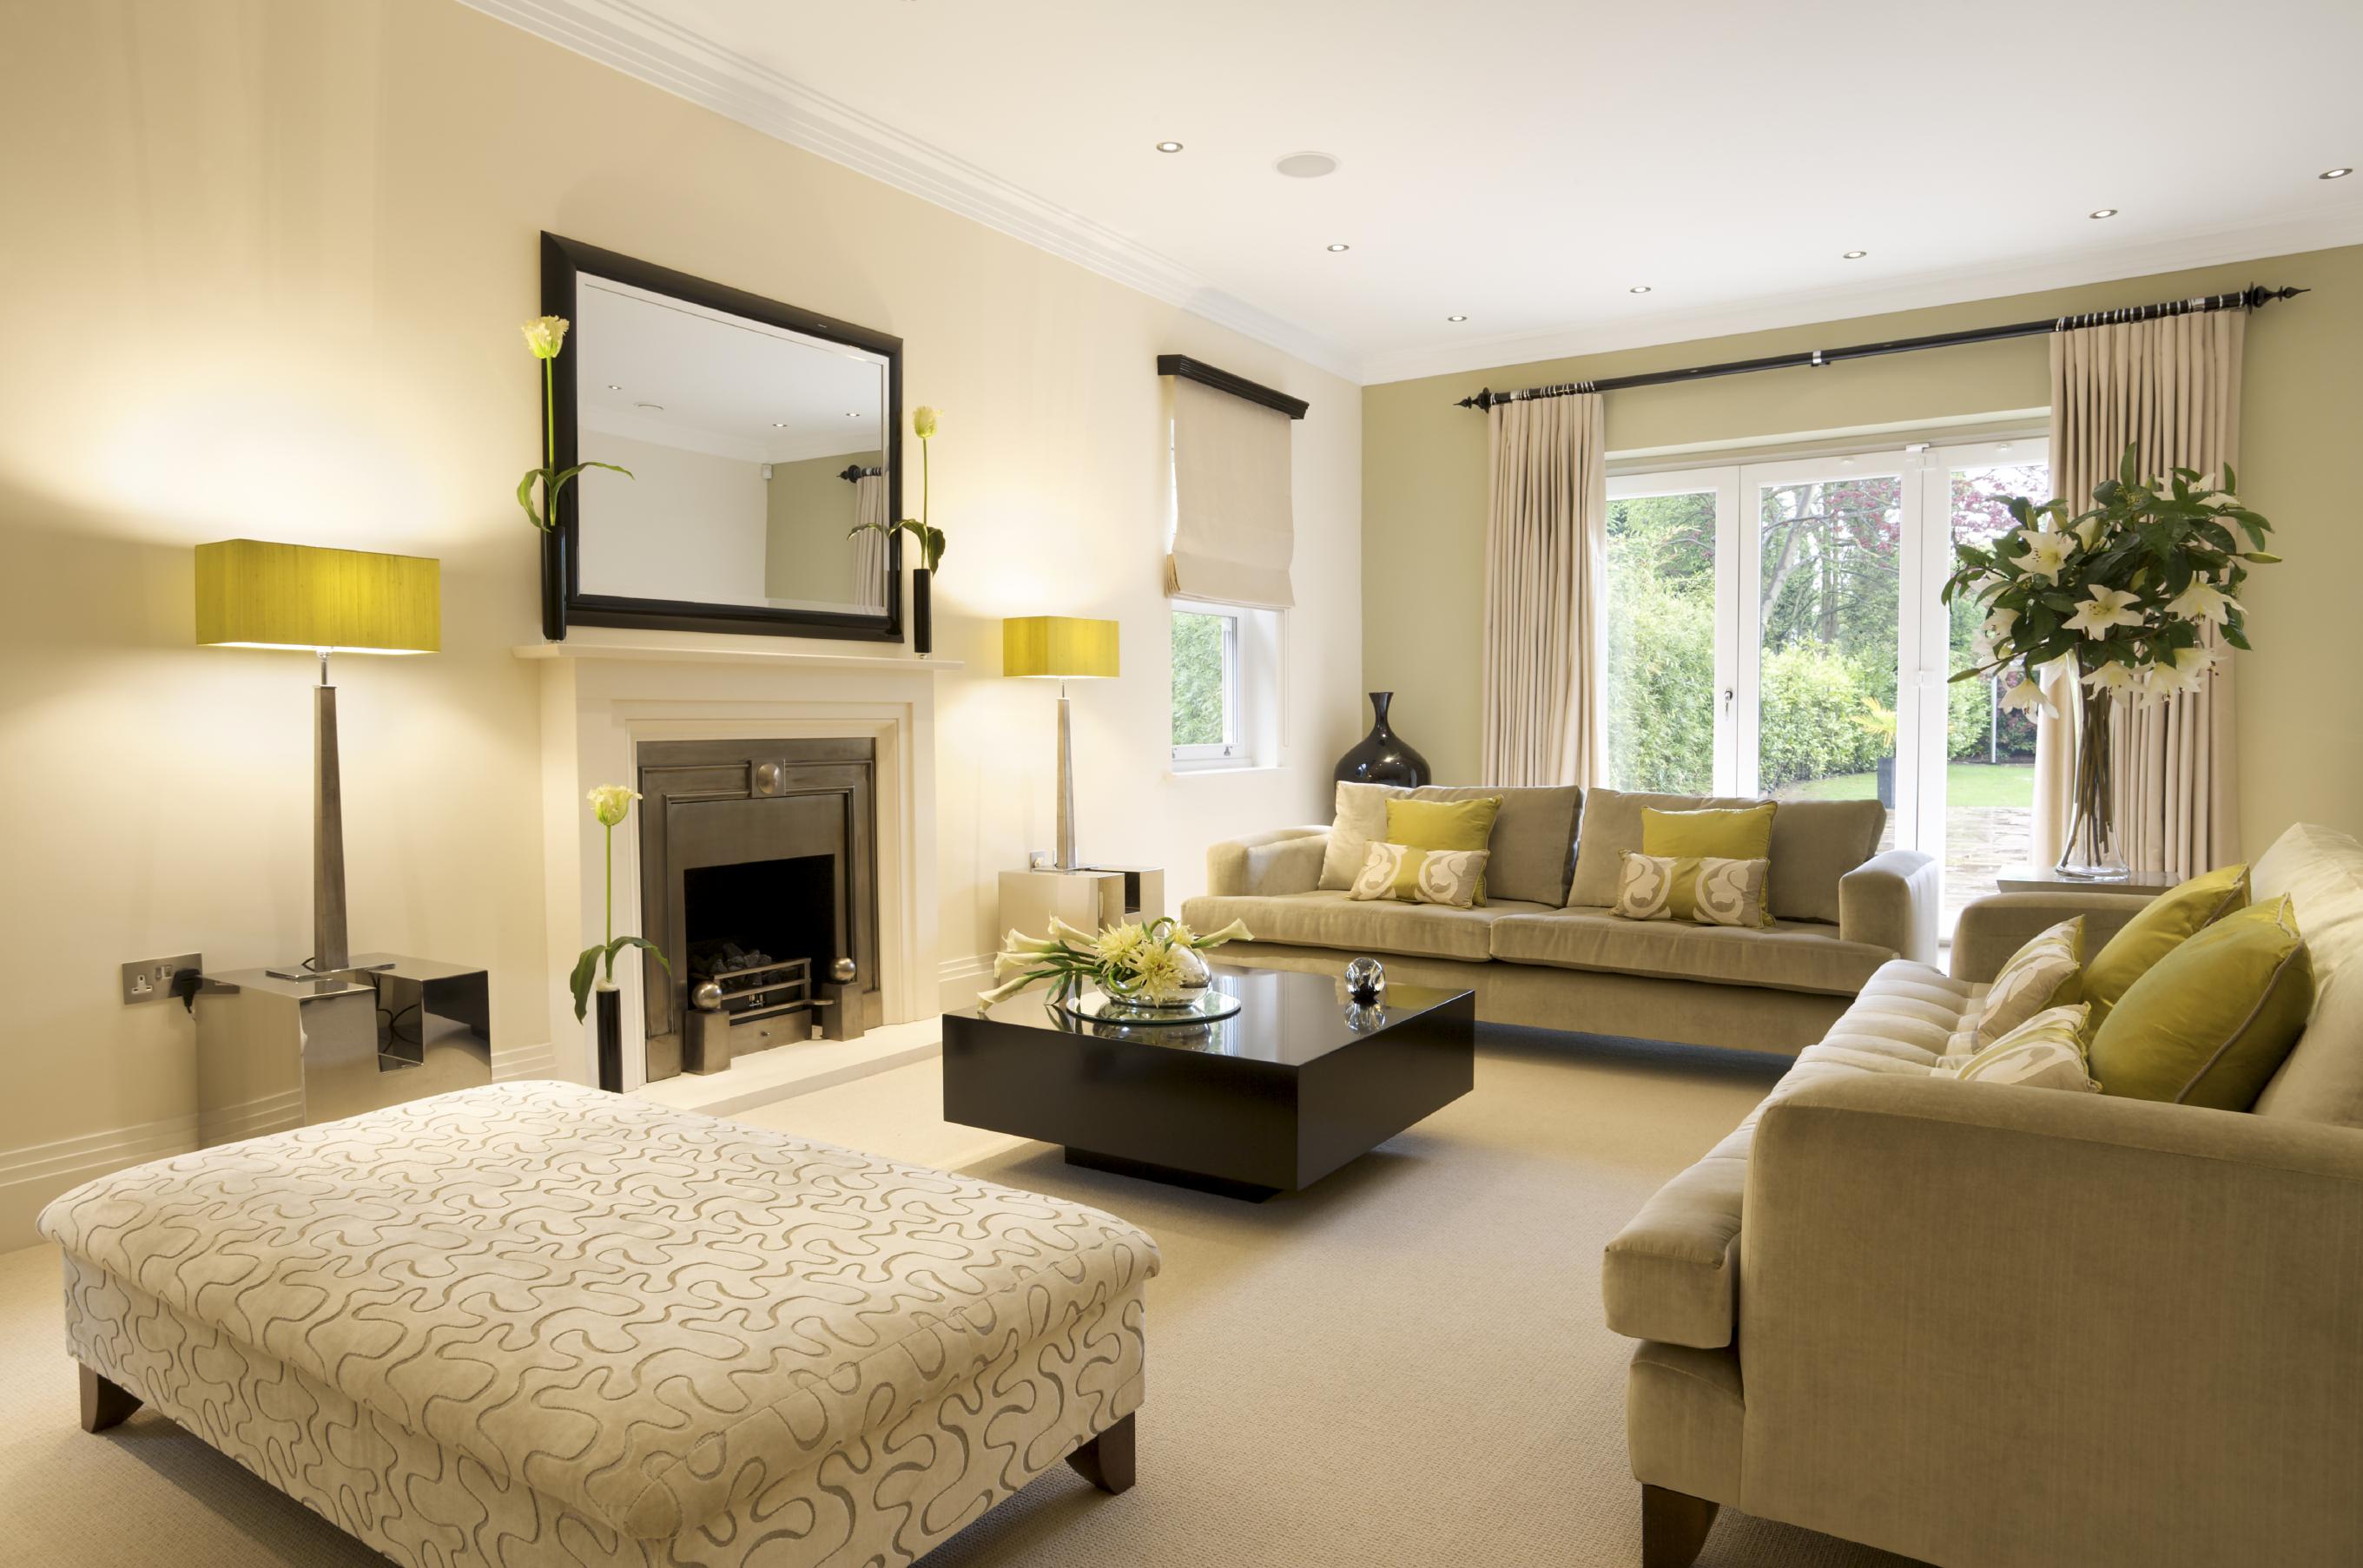 Soy Based Carpet Backing Steps Up Residential Sales Soy